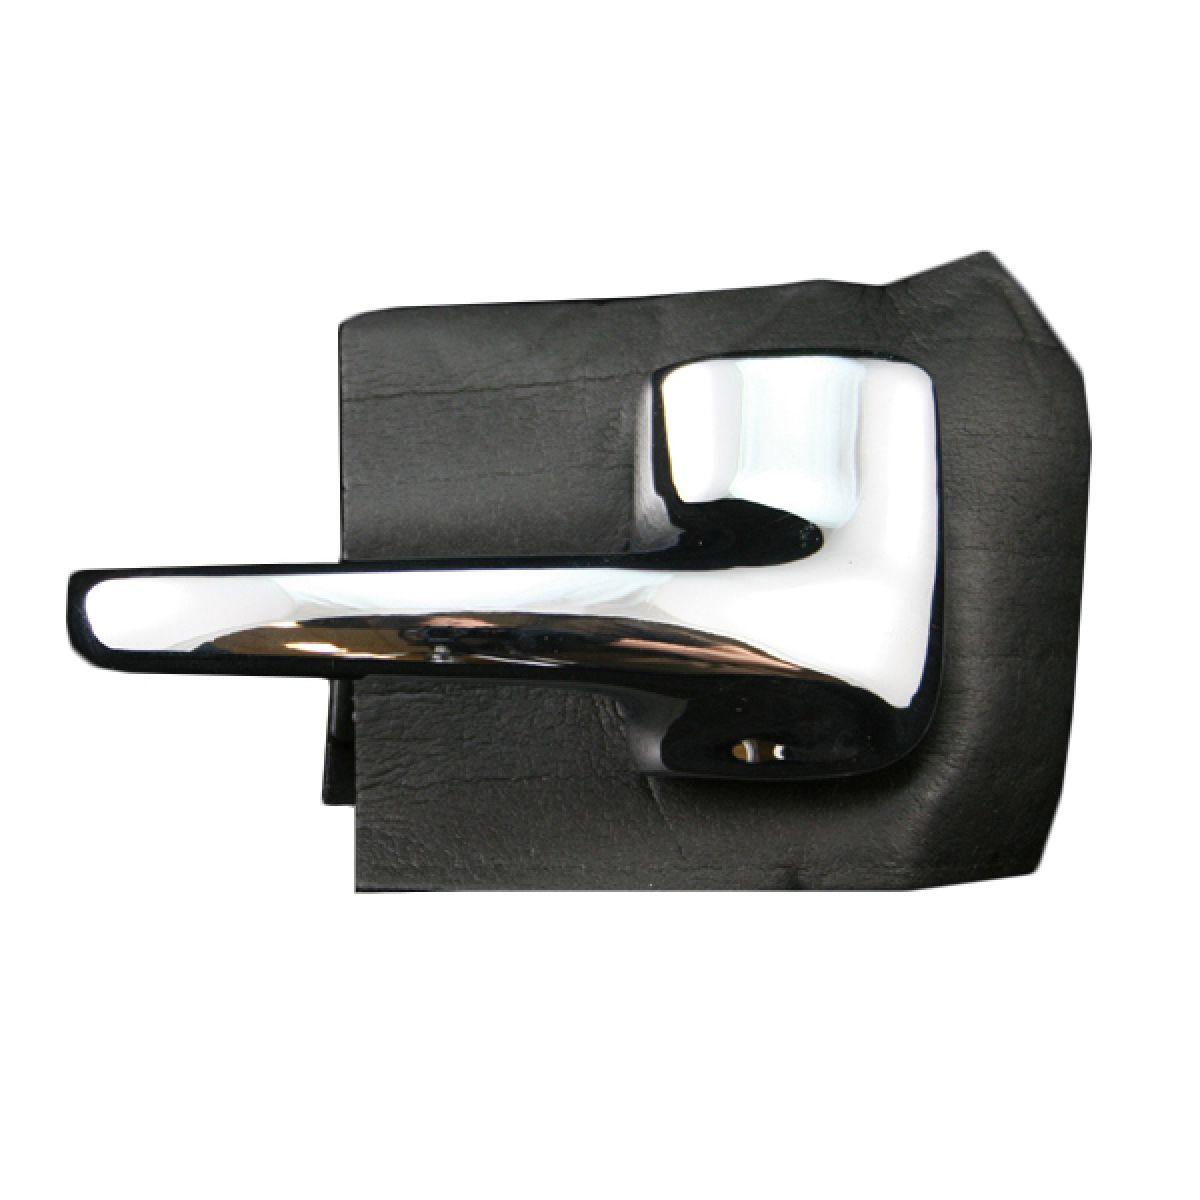 chrome inside interior door handle passenger side right rh for 95 97 town car ebay. Black Bedroom Furniture Sets. Home Design Ideas